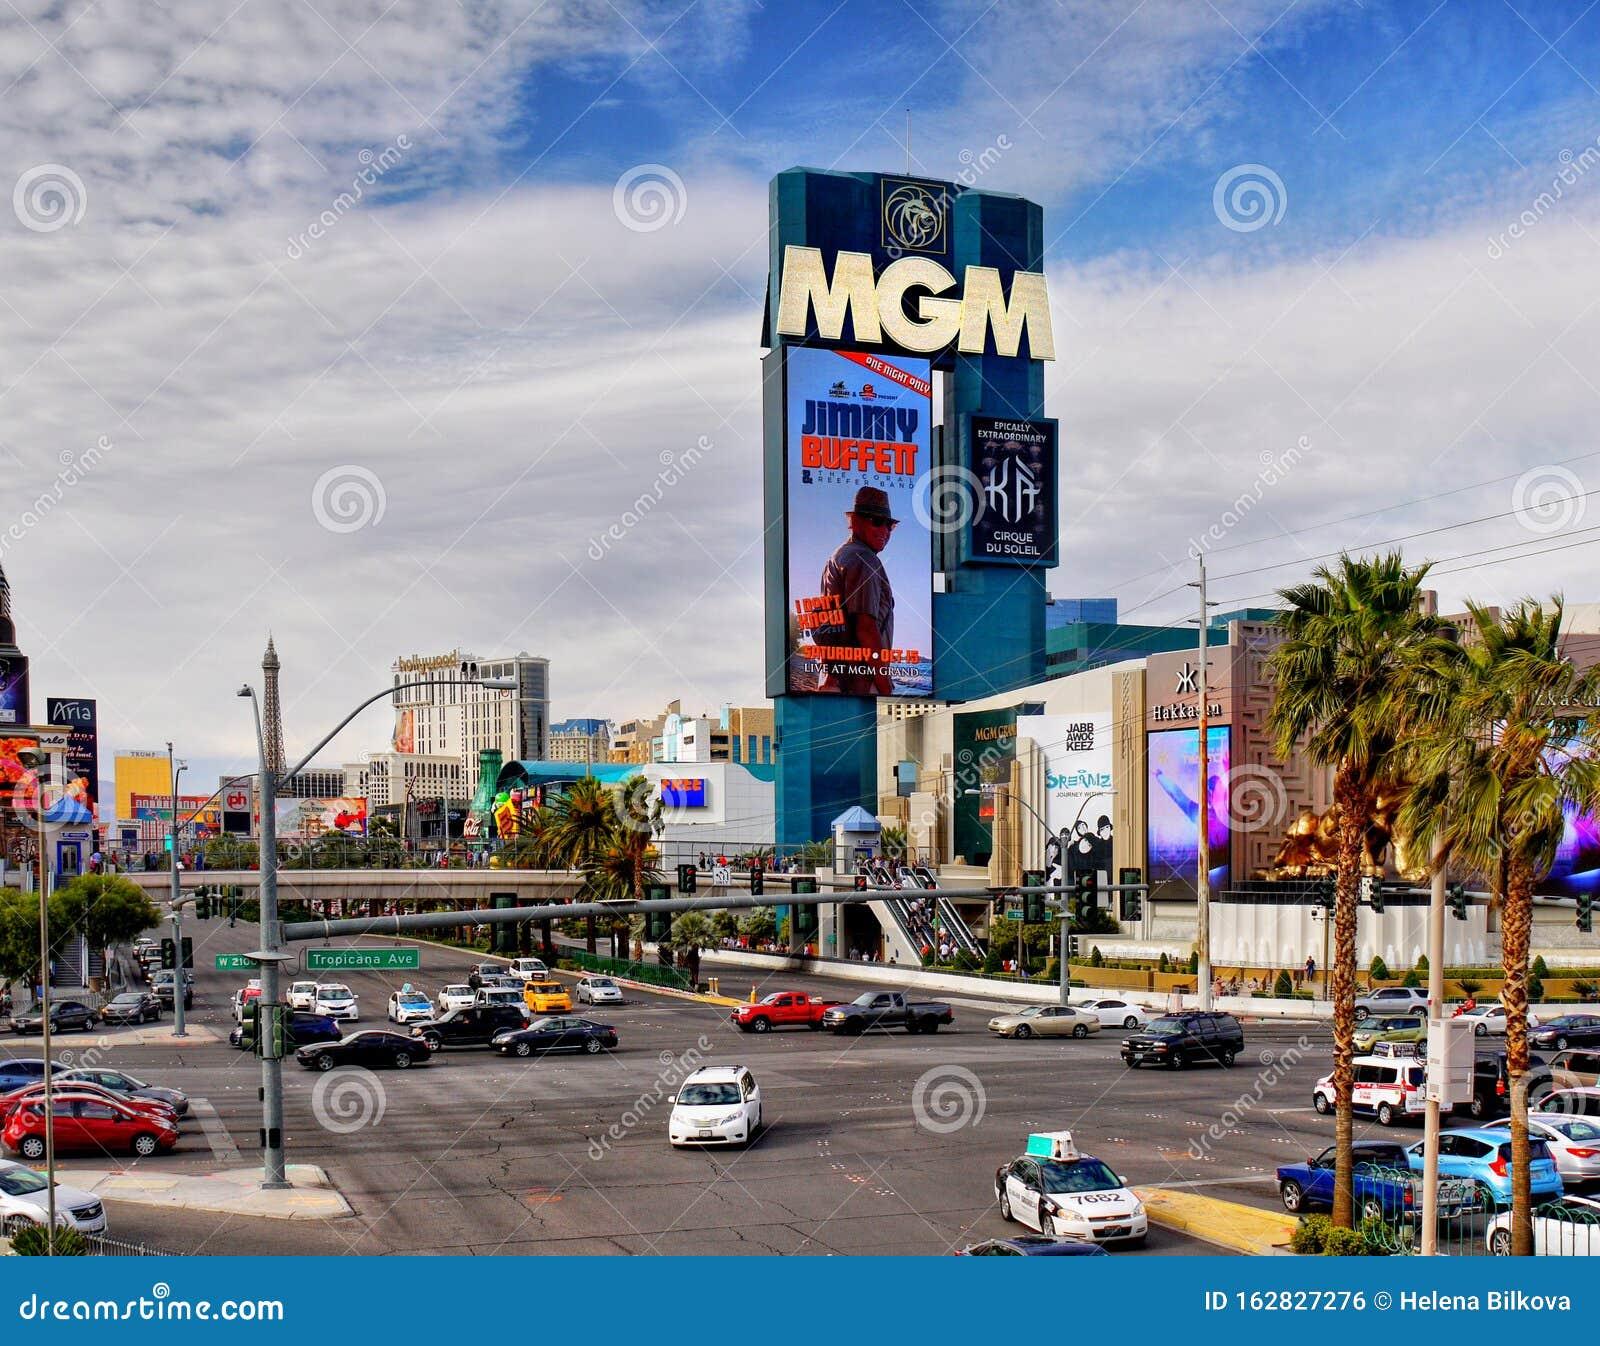 Mgm Grand Hotel Casino Las Vegas Strip Editorial Photo Image Of Strip Resort 162827276